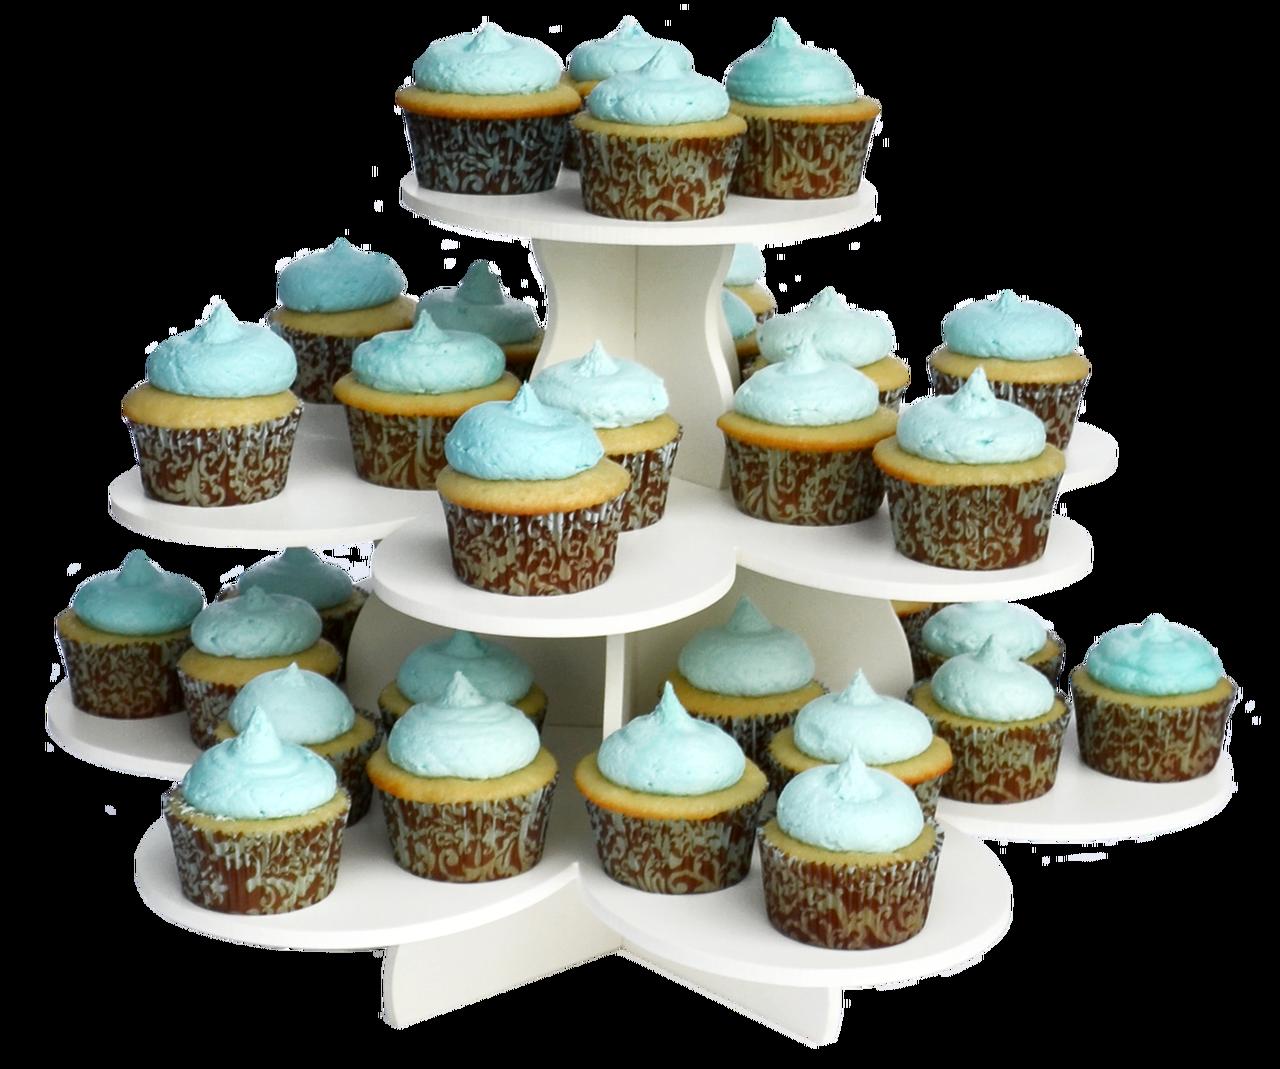 3 Tier Flower Cupcake Tower Cupcake Tower Stand Dessert Stand Cupcake Tower